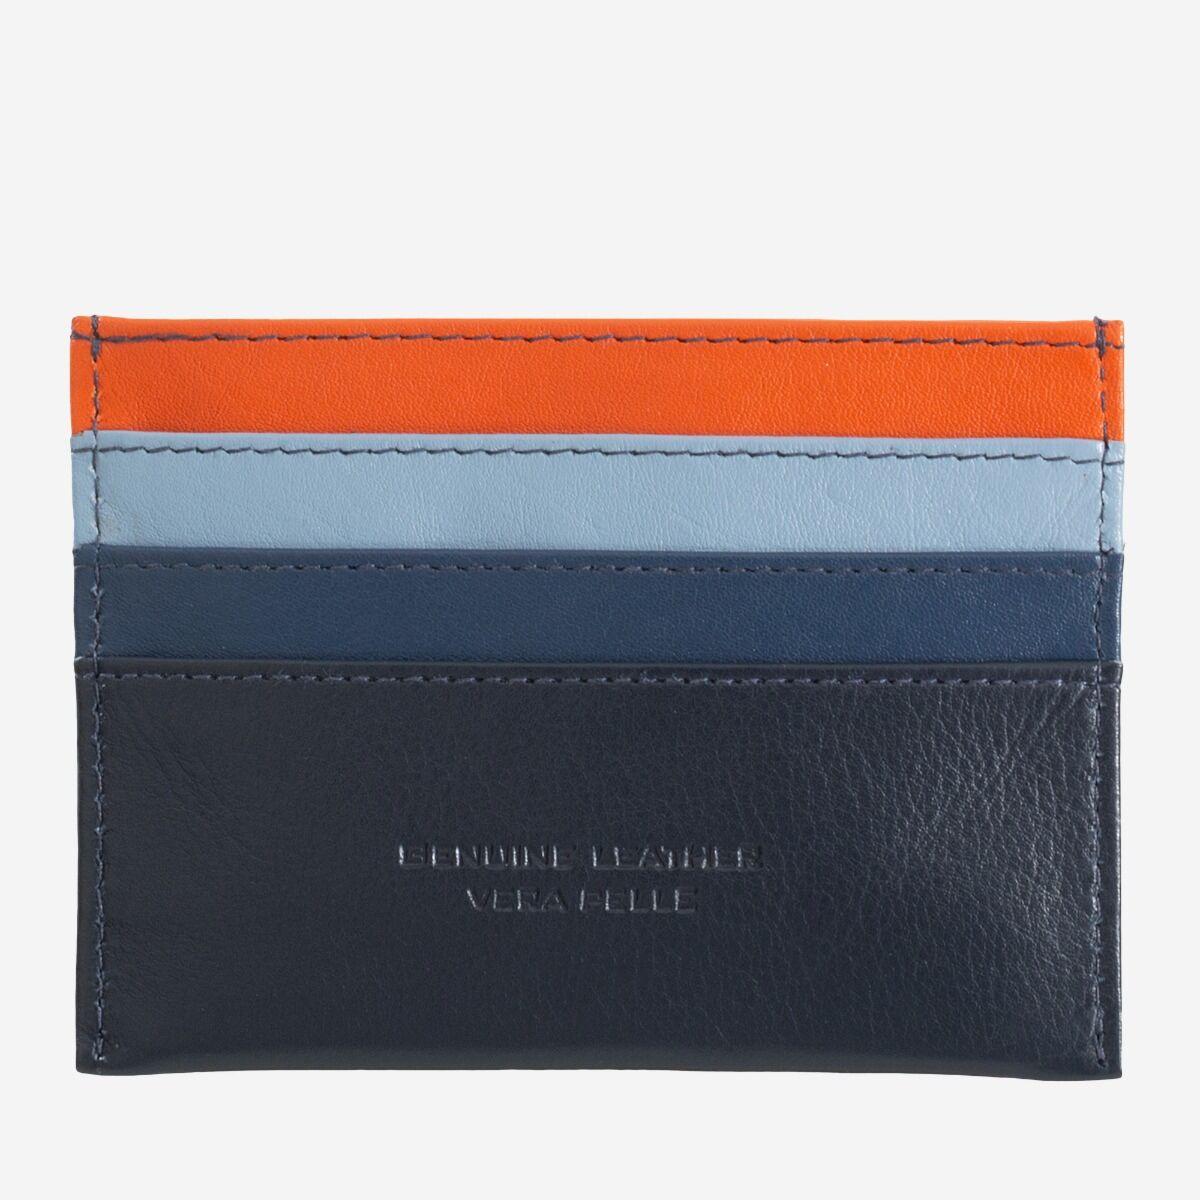 DuDu ארנק מינימליסטי לכרטיסי אשראי - כחול נייבי